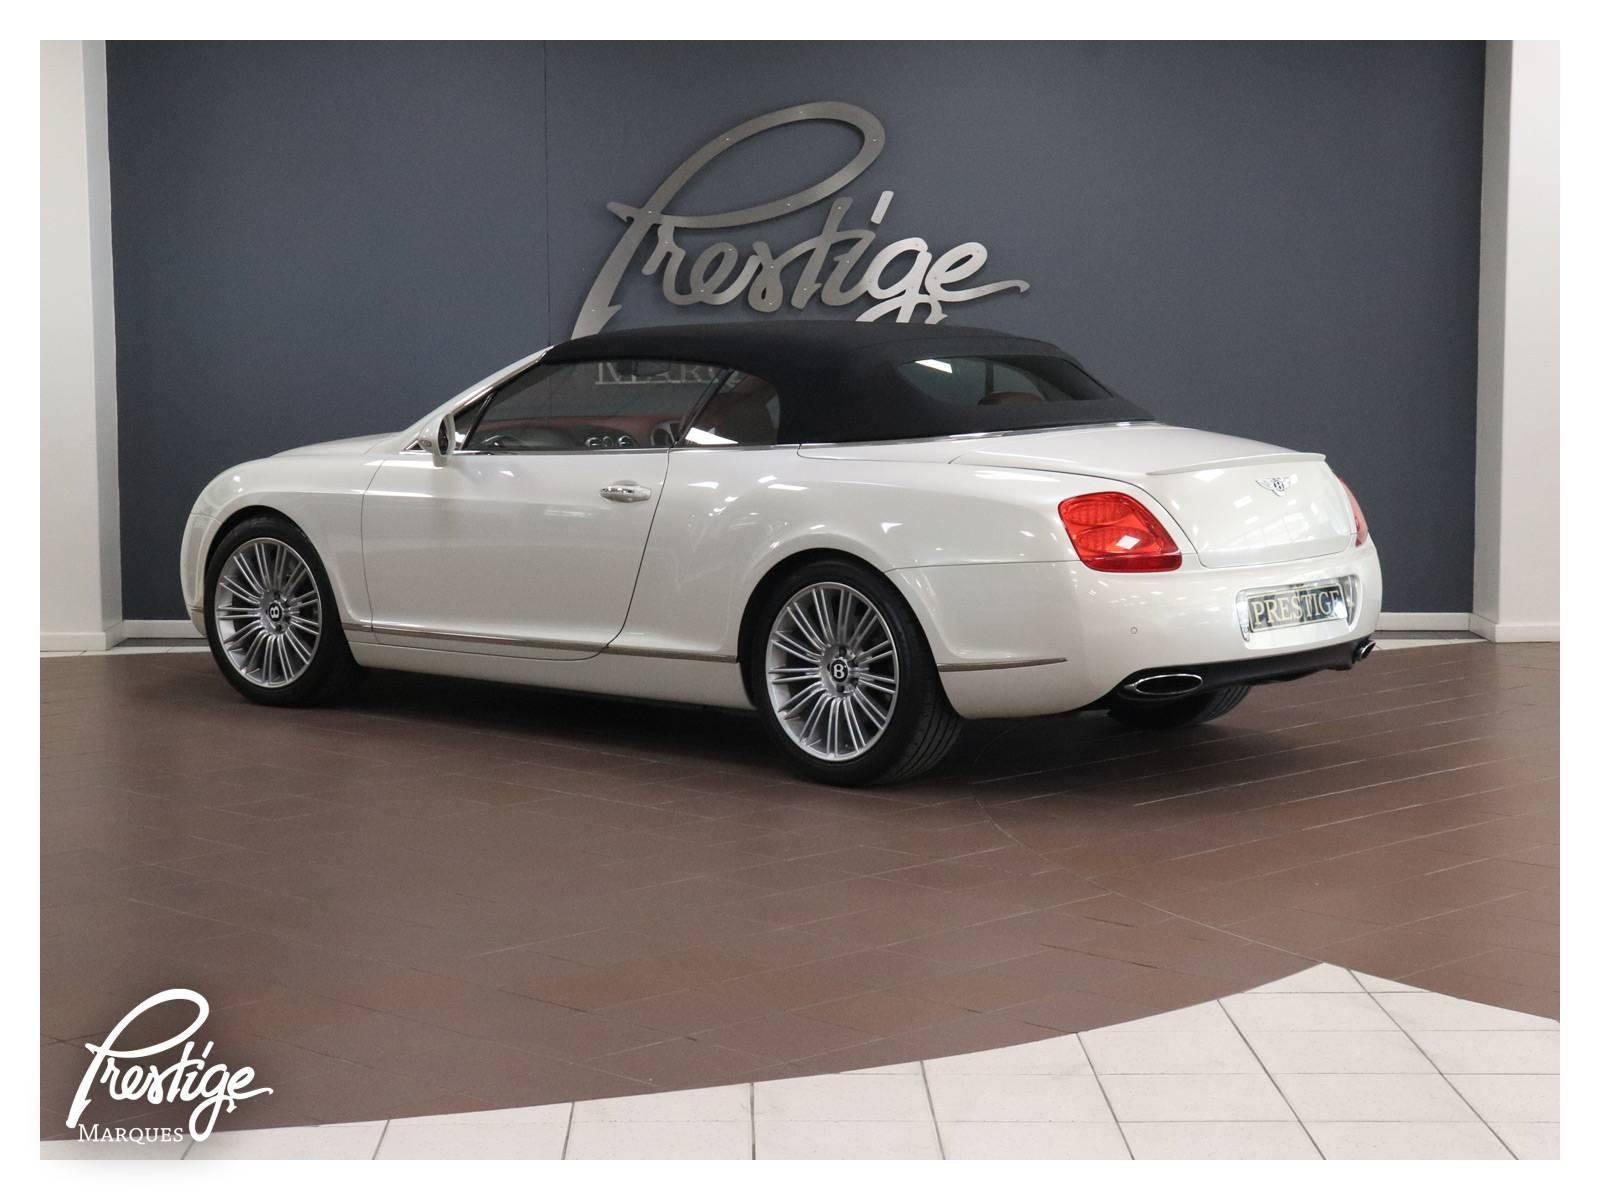 2011-Bentley-continental-Prestige-Marques-Randburg-Sandton-4